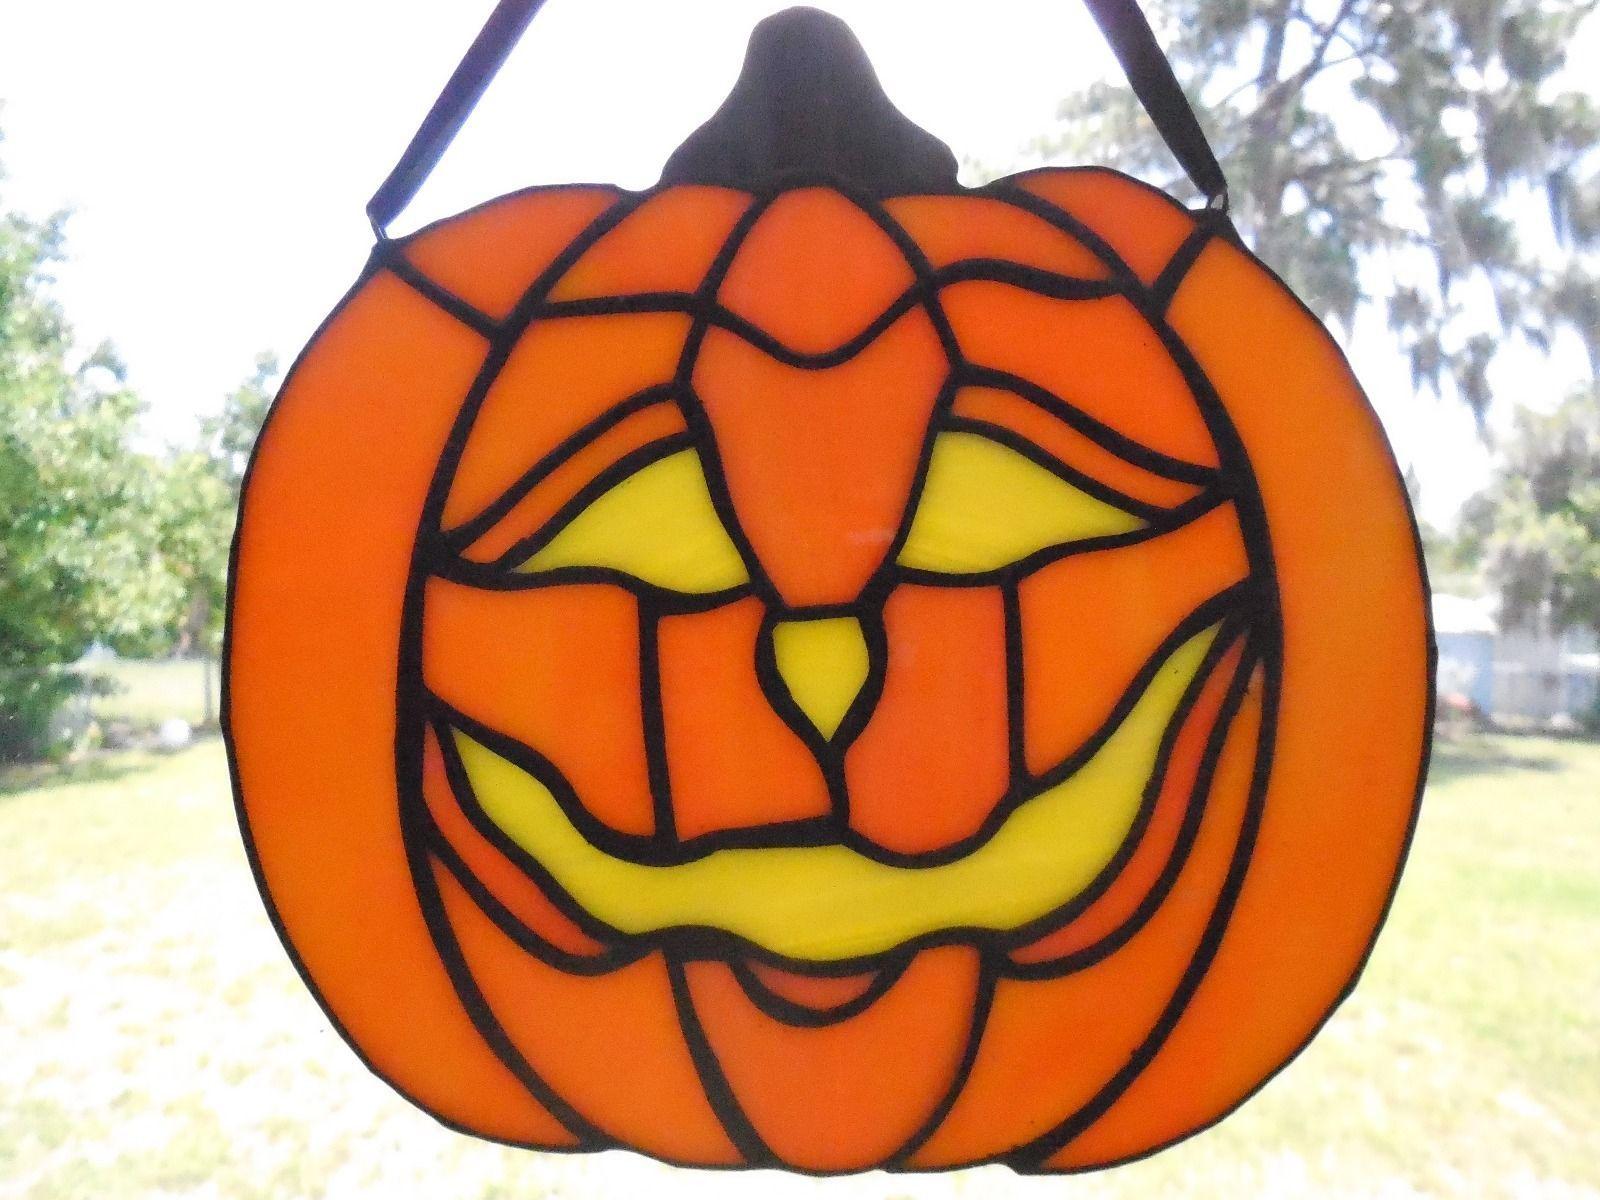 Stained Glass Jackolantern Pumpkin